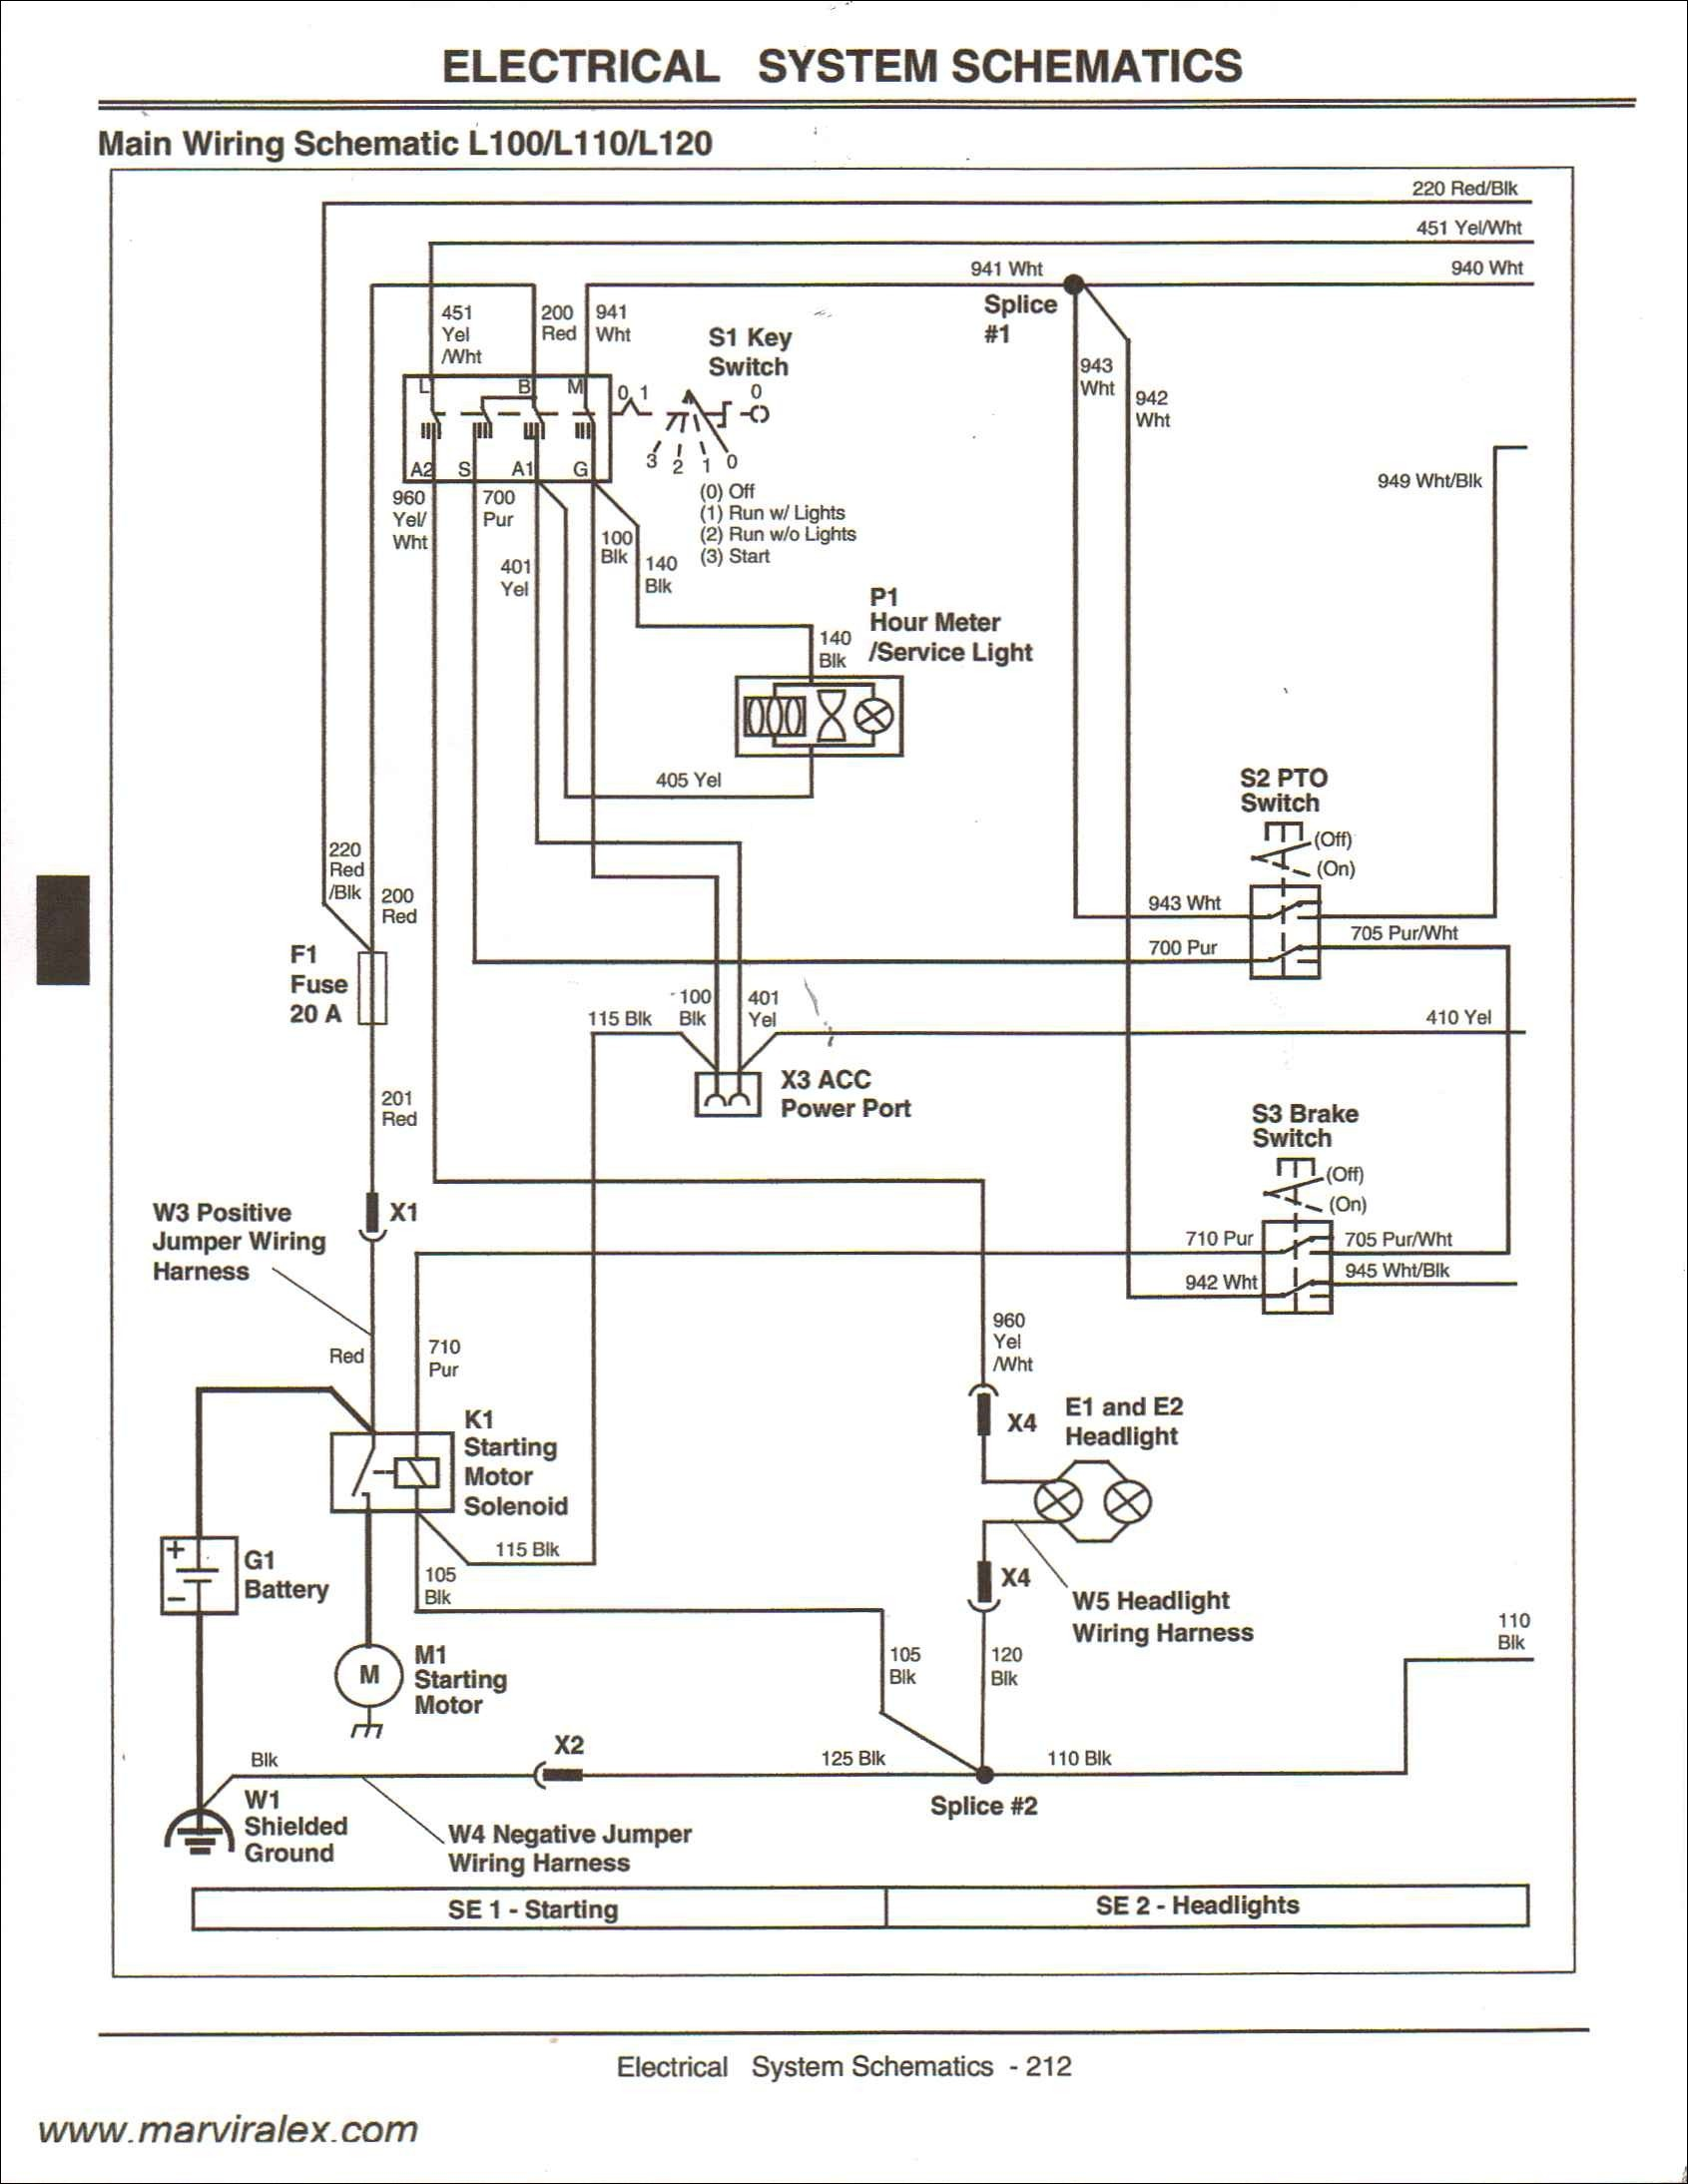 X540 John Deere Fuse Box - Wiring Diagram Models wait-strong -  wait-strong.zeevaproduction.it | X540 Wiring Diagram |  | wait-strong.zeevaproduction.it